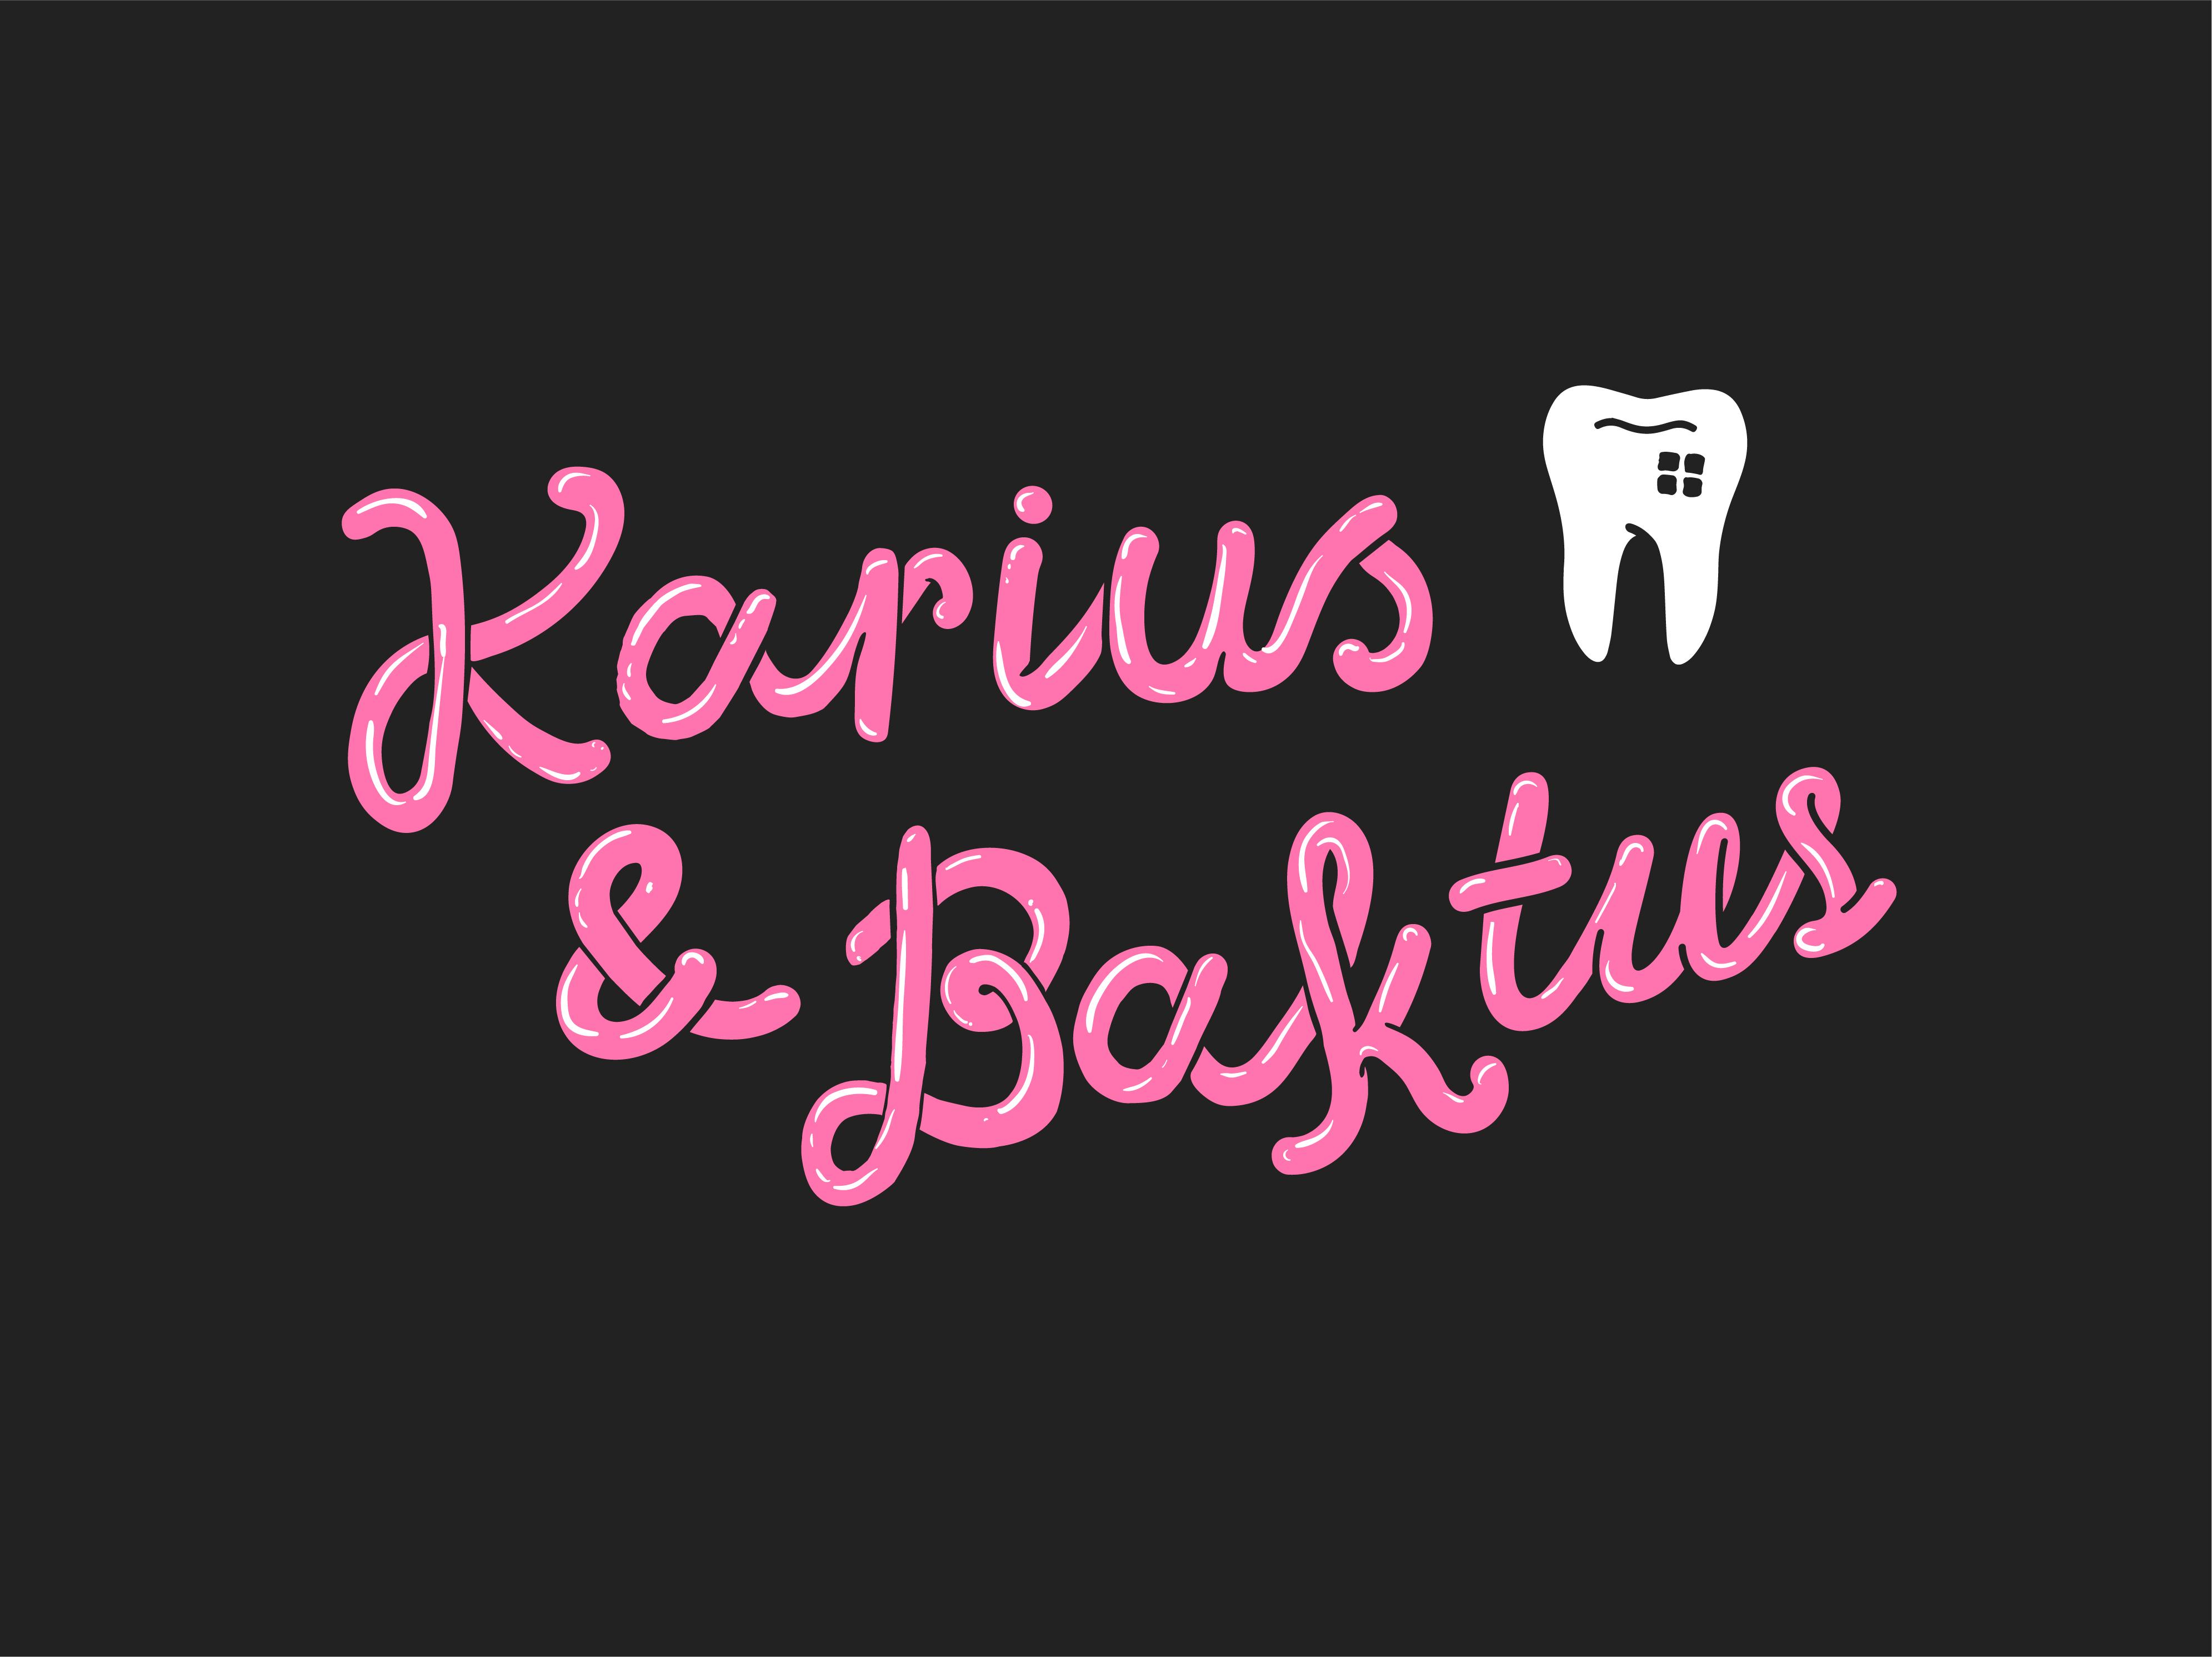 Karius&Baktus_titel